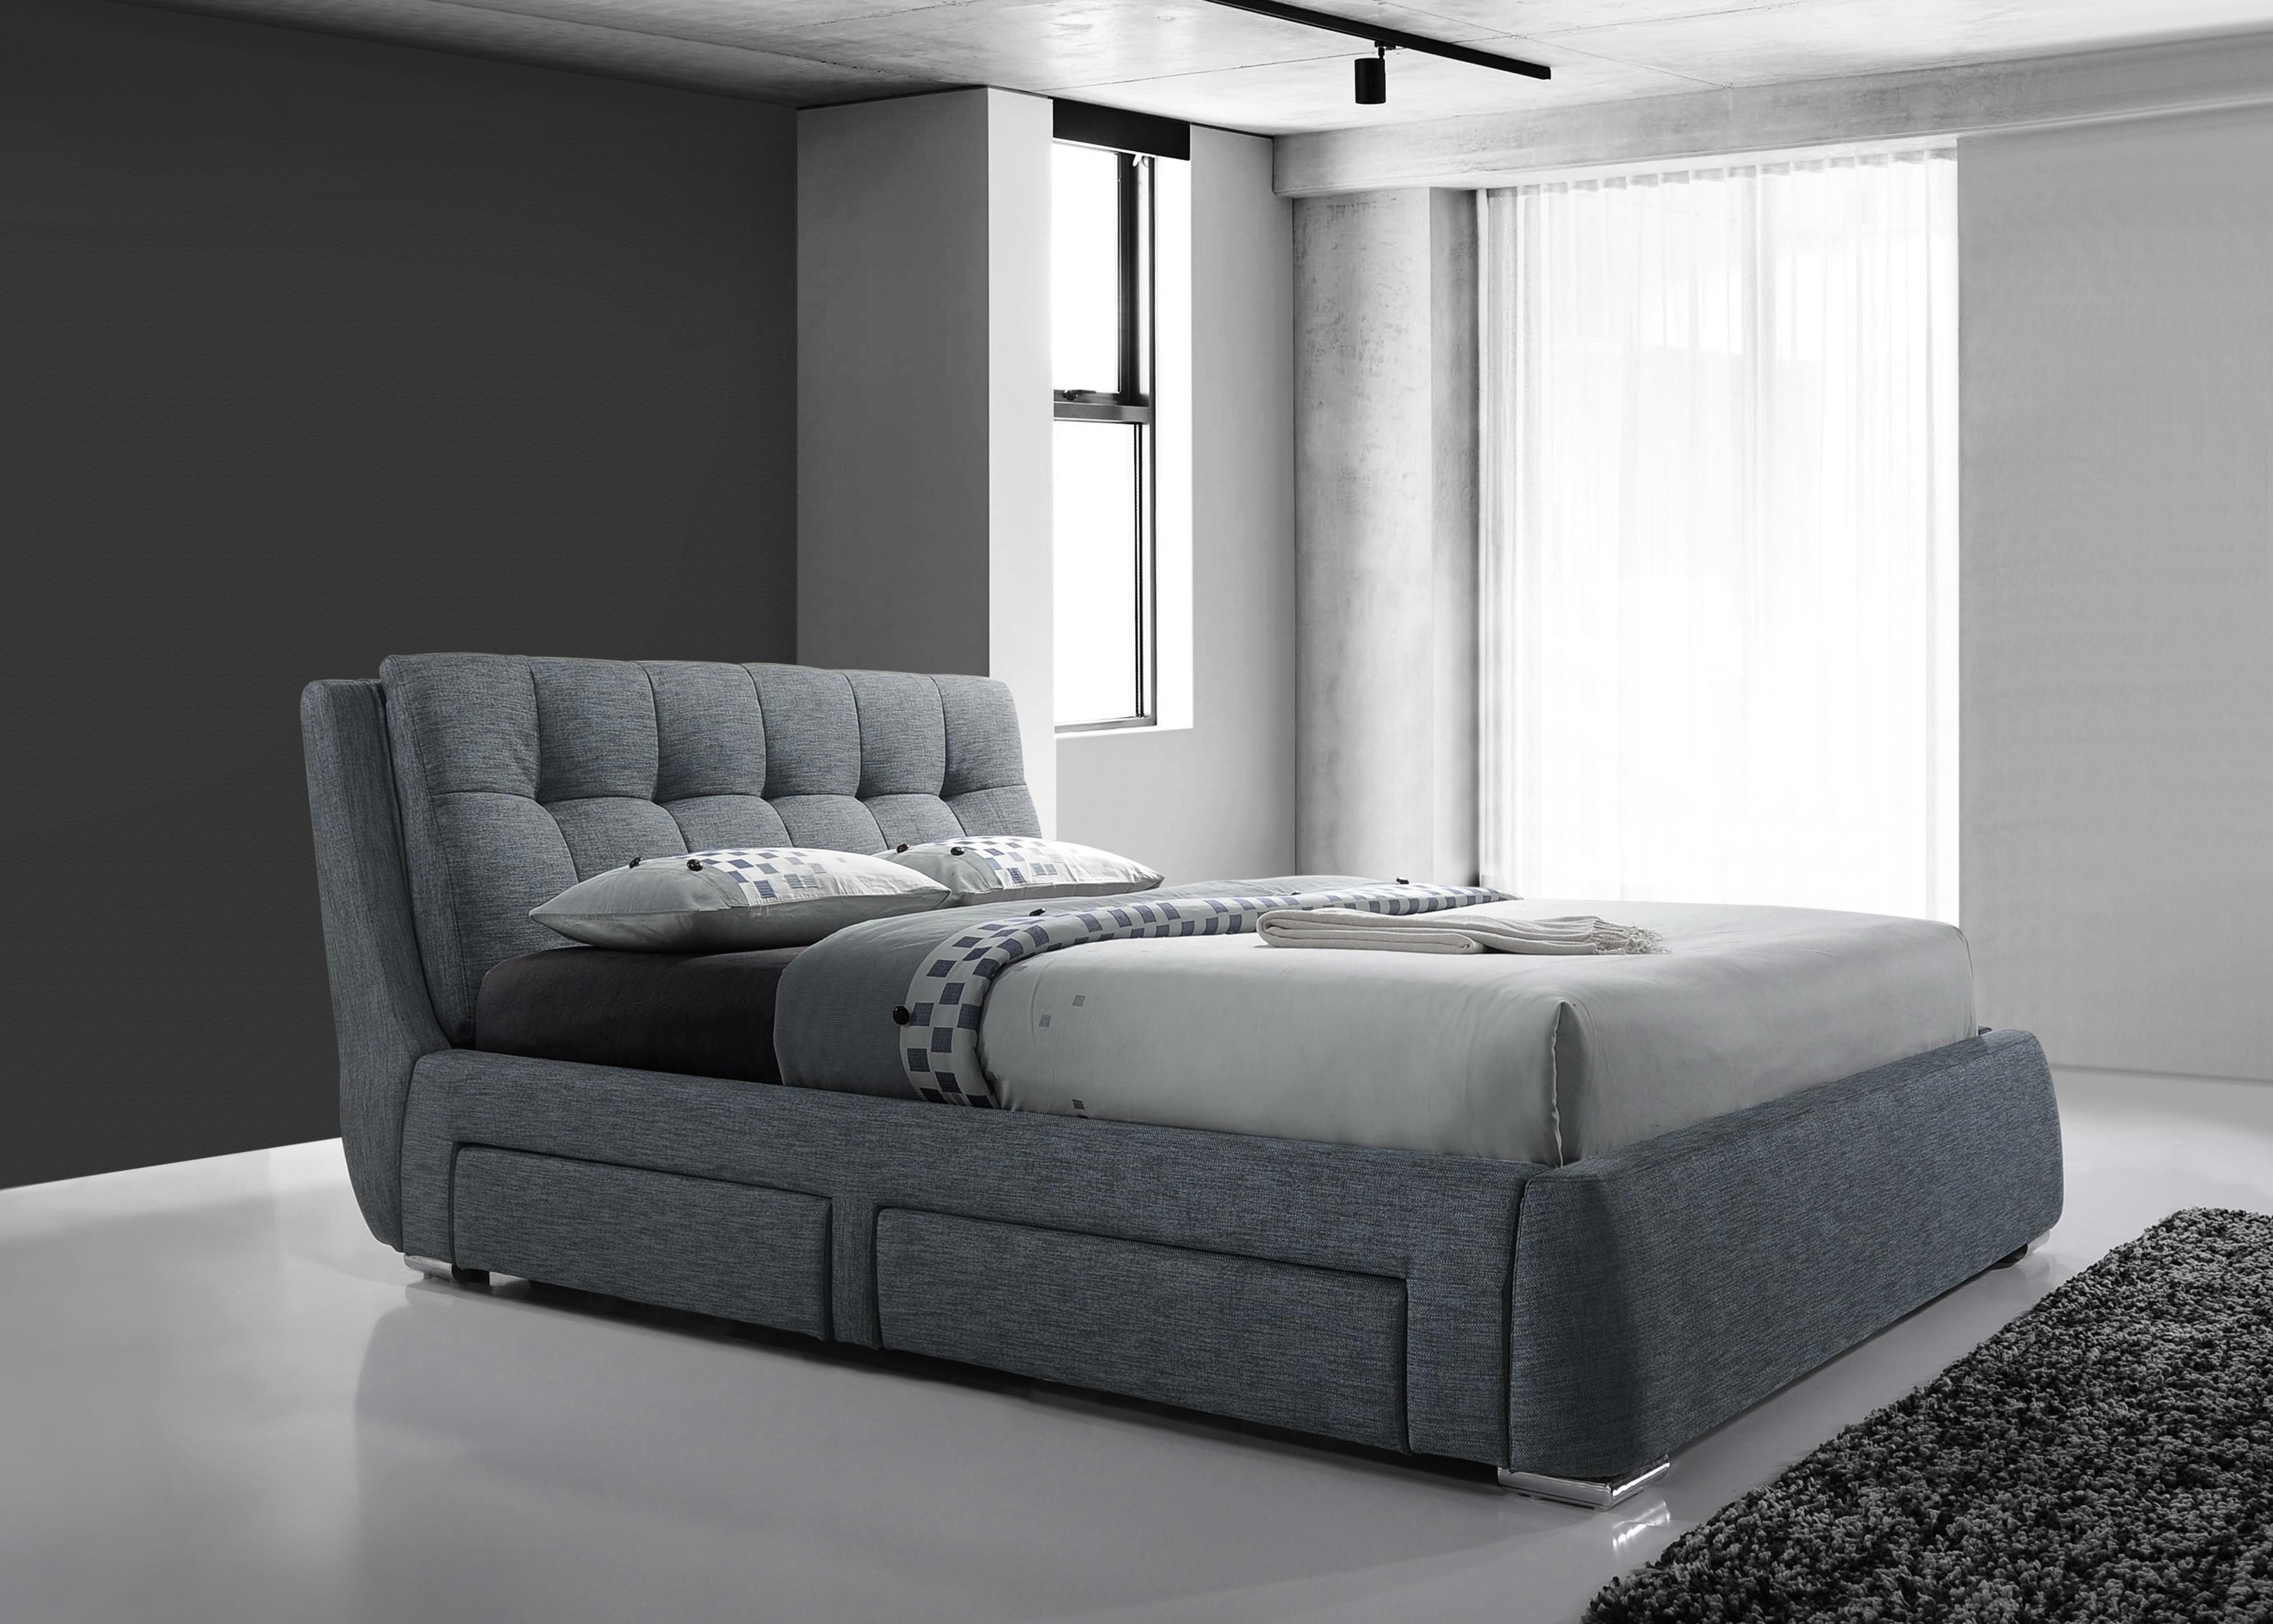 Designer Fabric 4 Drawer Storage Bed Light Grey 4ft6